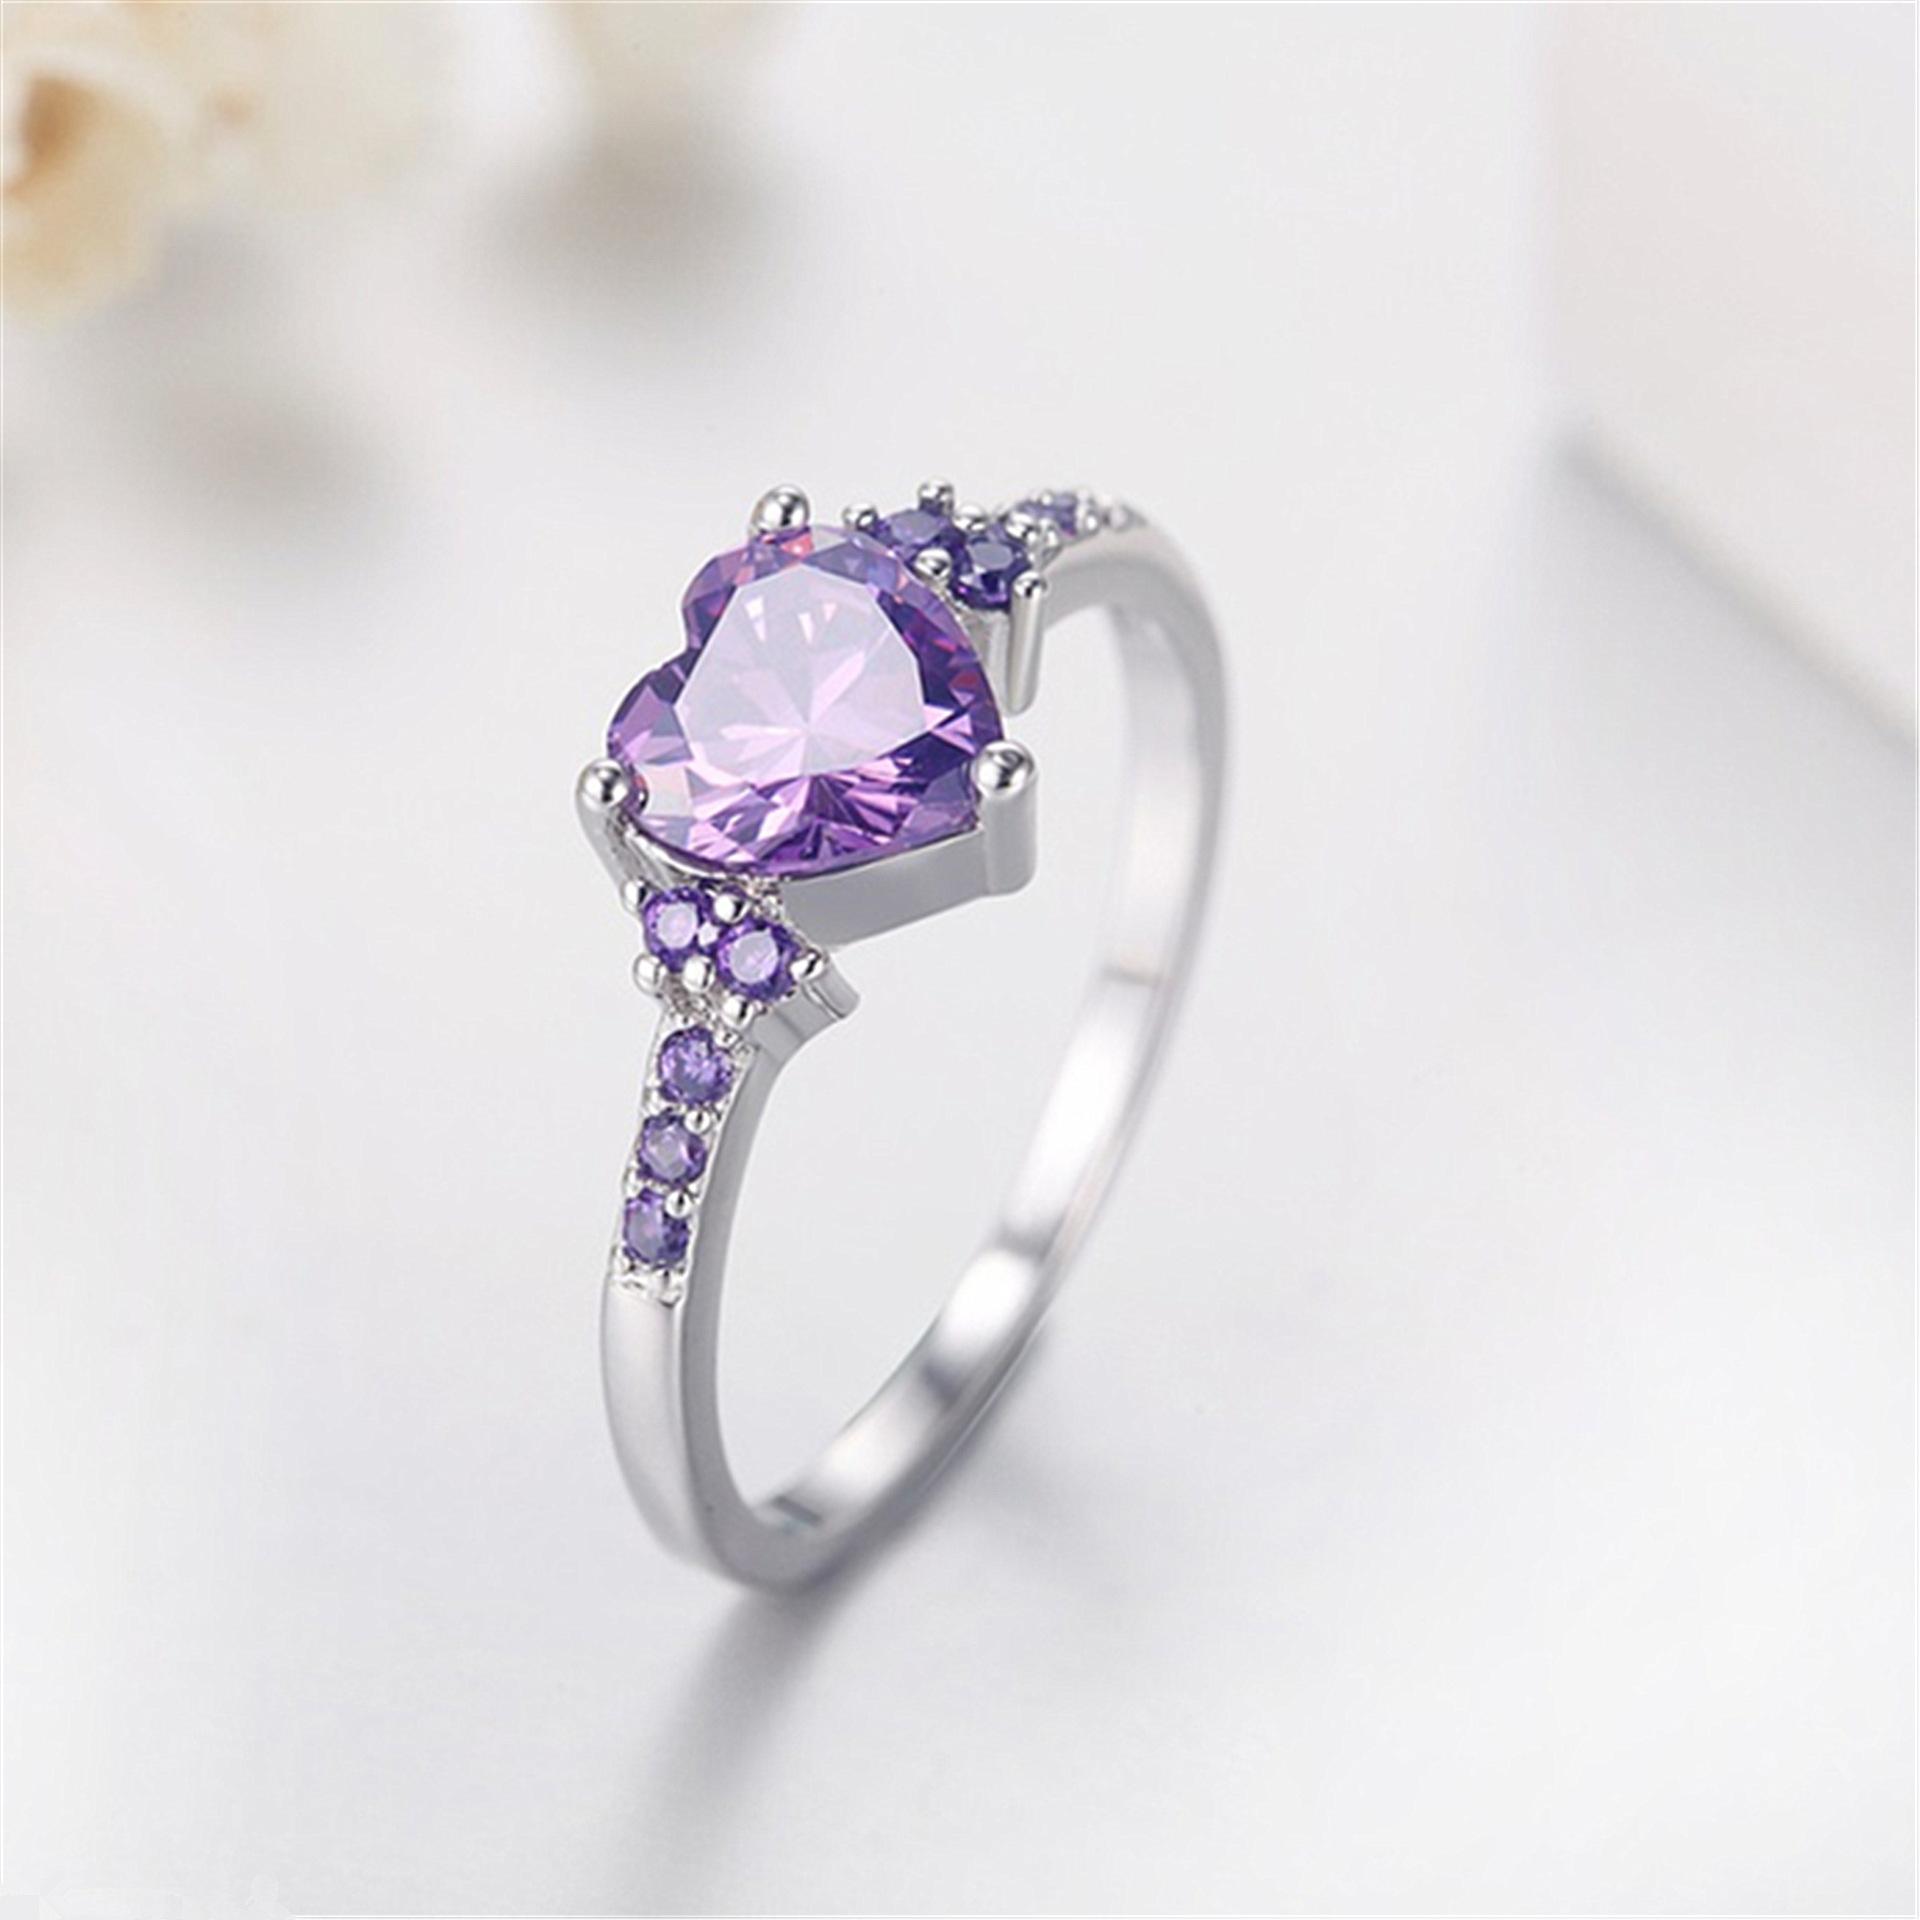 Natural Amethyst Wedding Ring | ohiogem